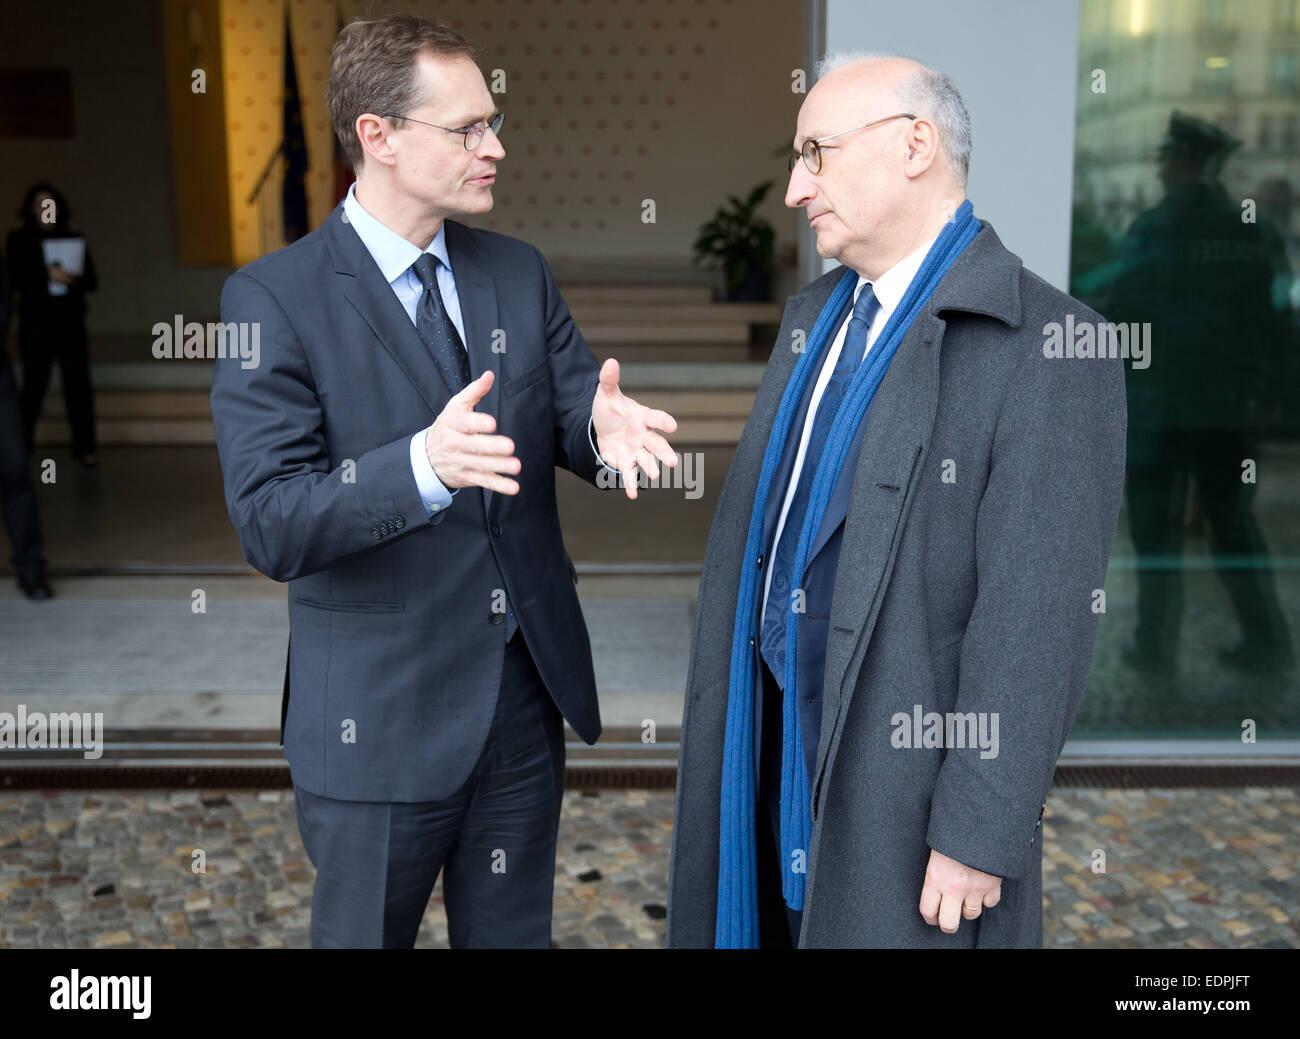 Joerg Mueller L Stockfotos & Joerg Mueller L Bilder - Alamy